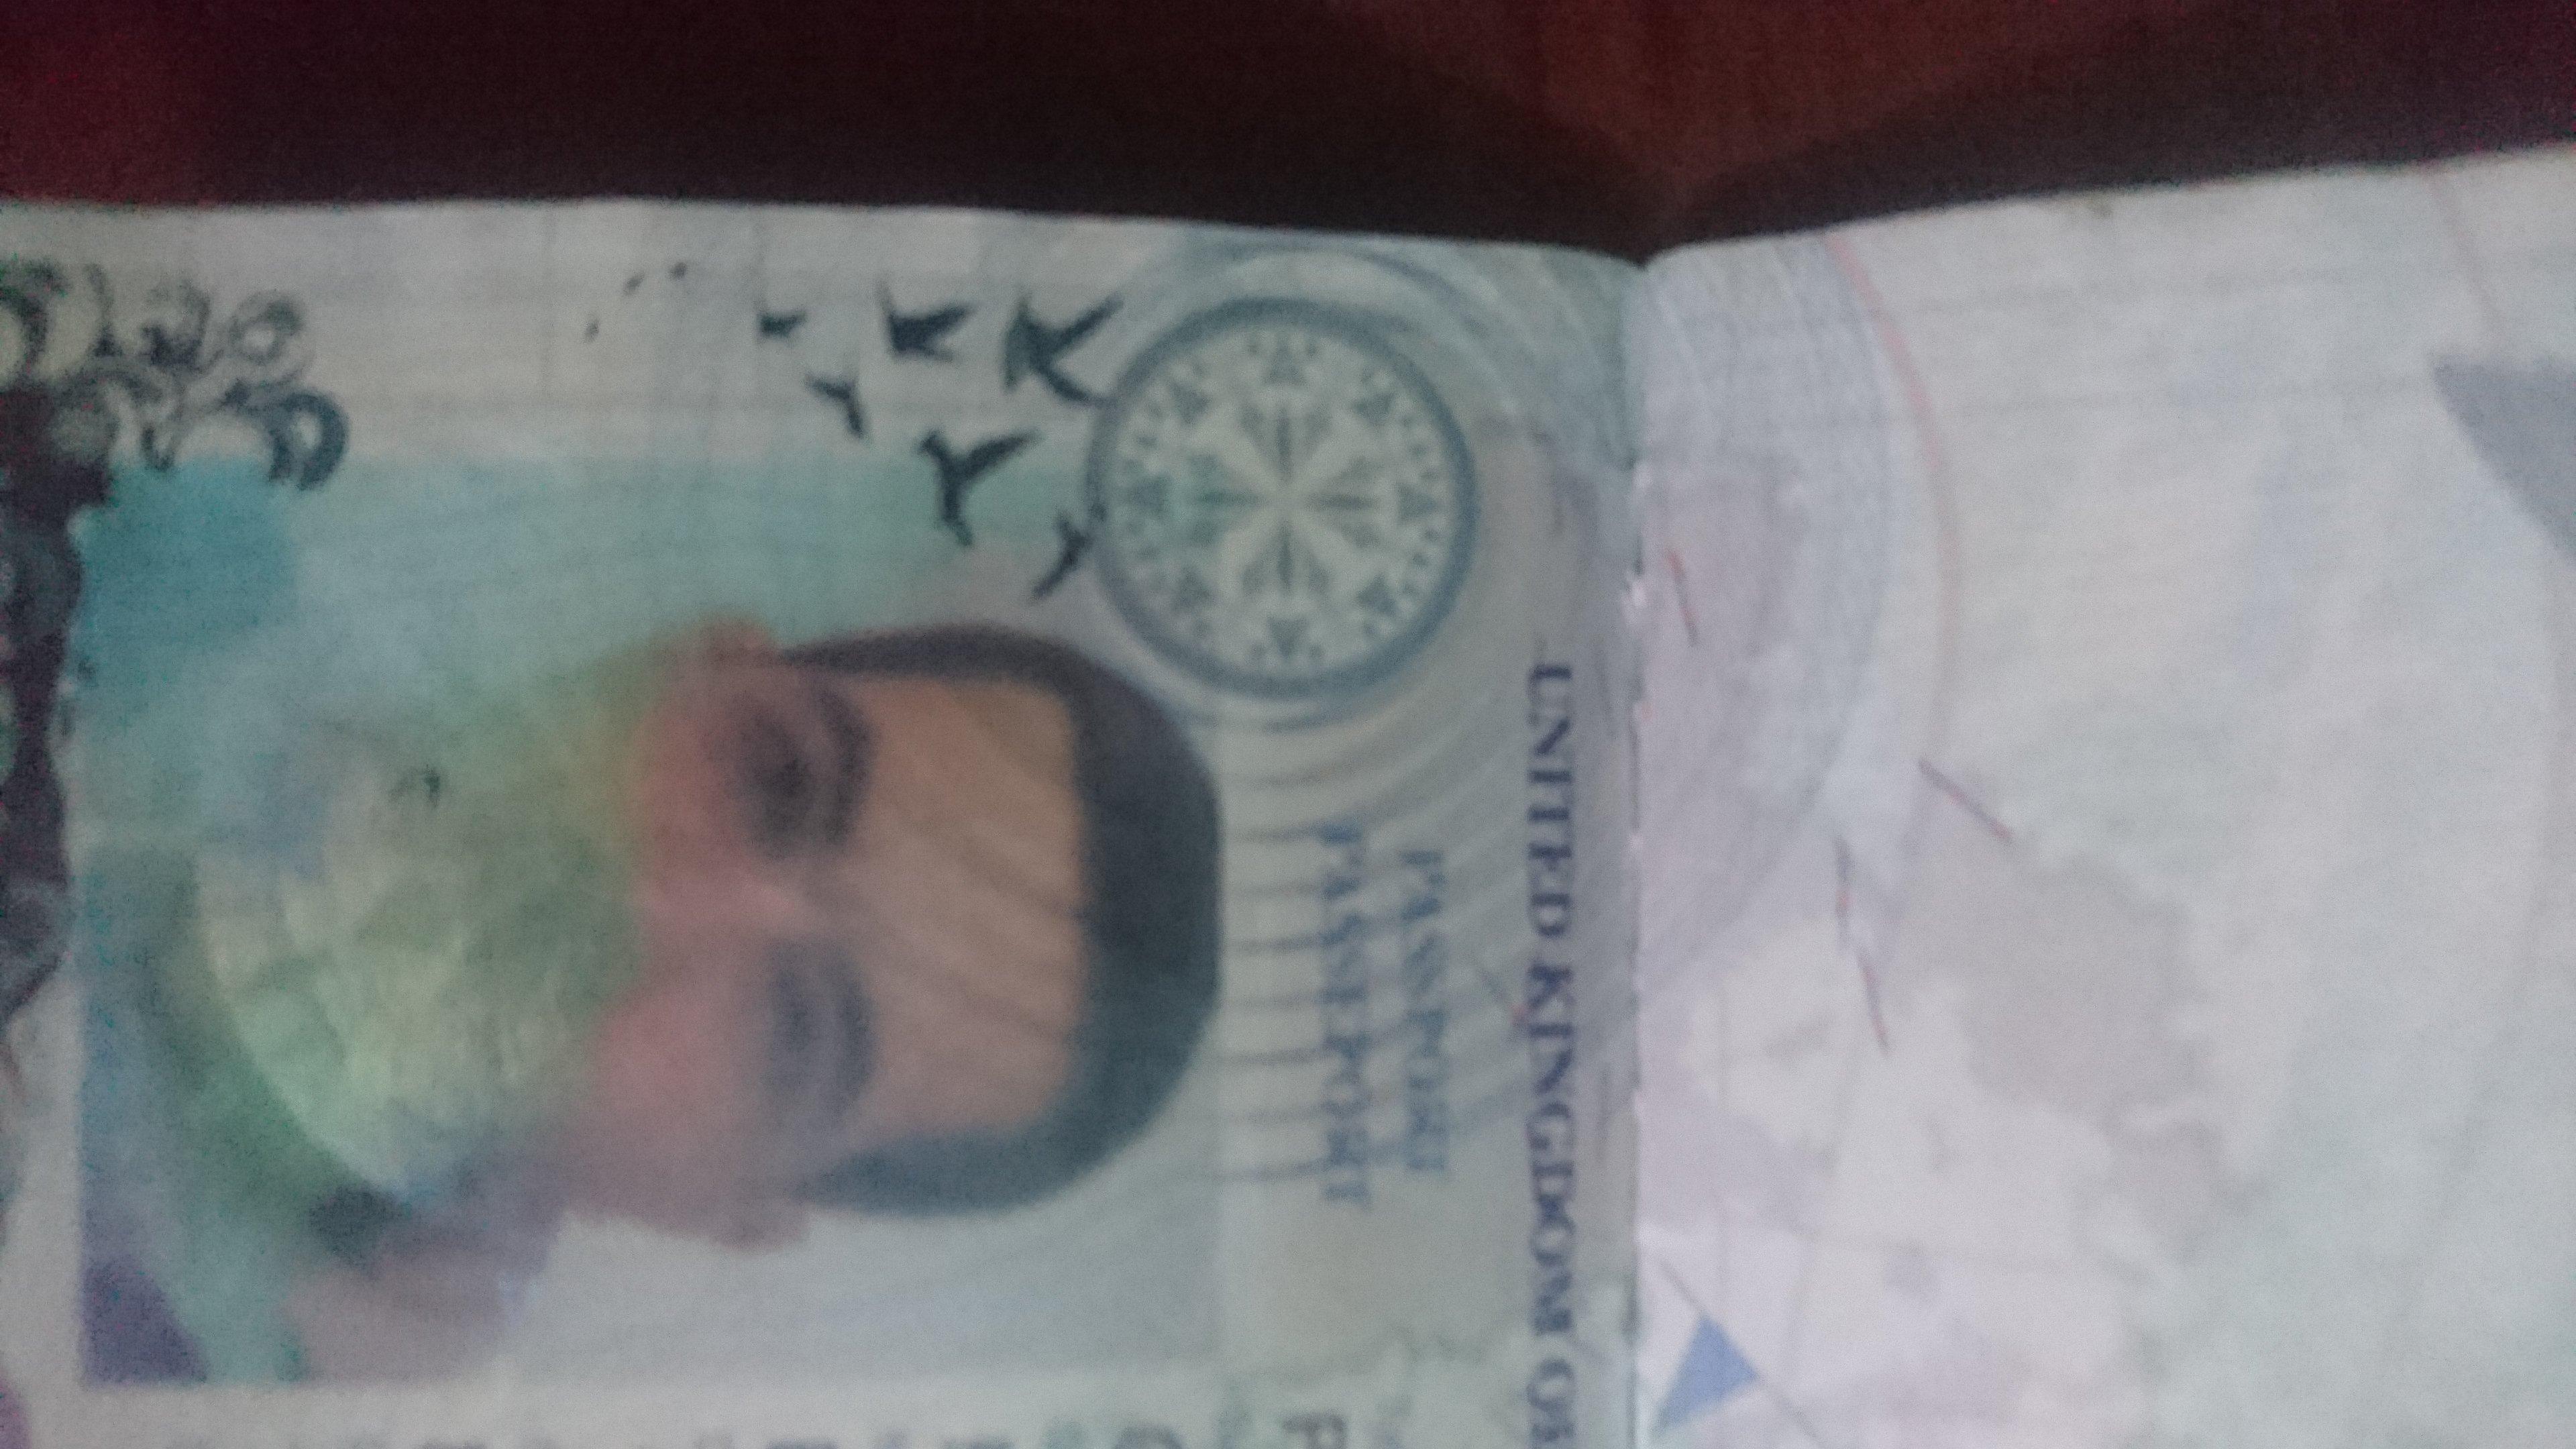 Damaged Photo In Passport Thai Visas Residency And Work